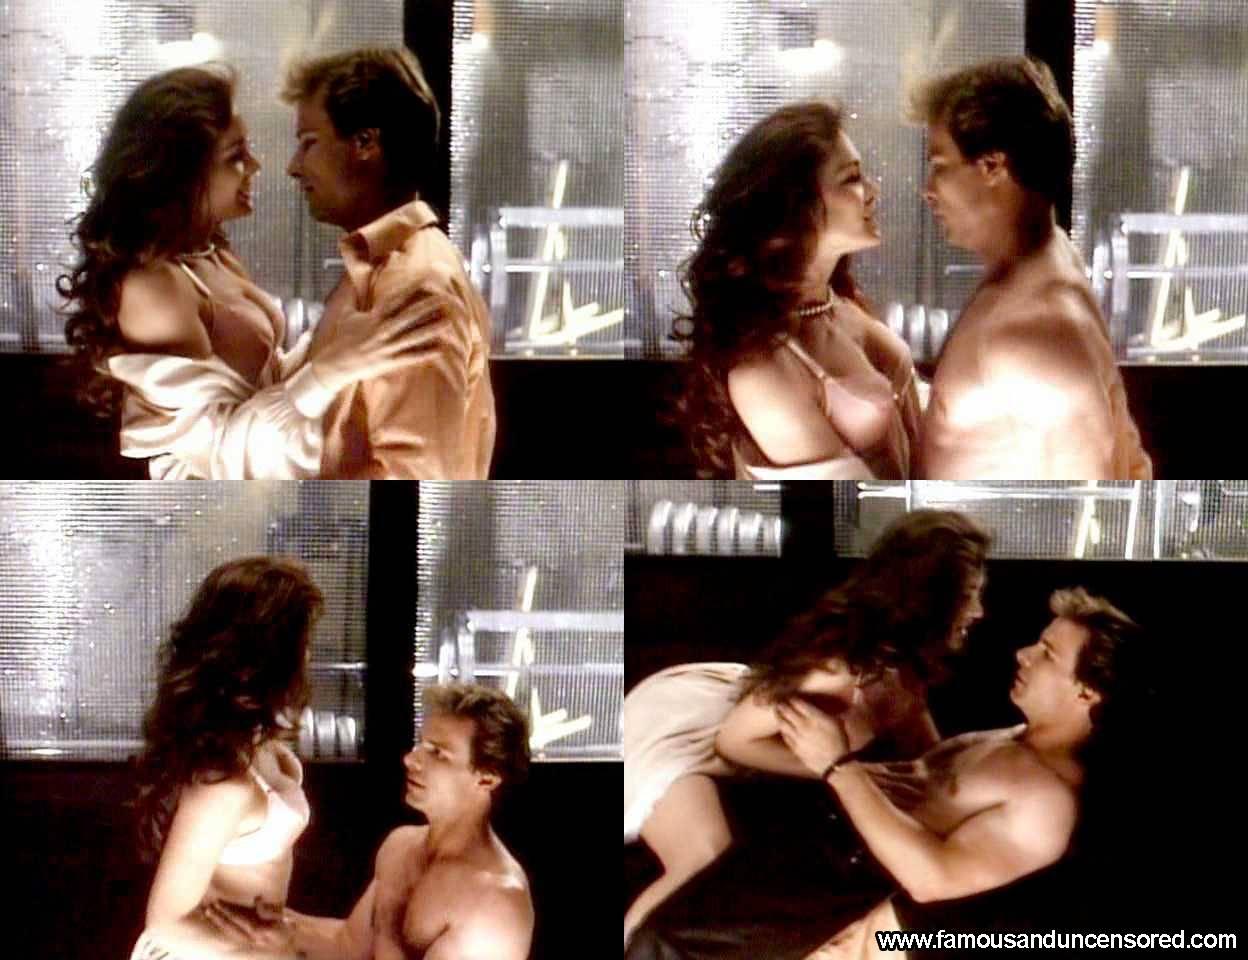 Denise crosby naked scenes — 1